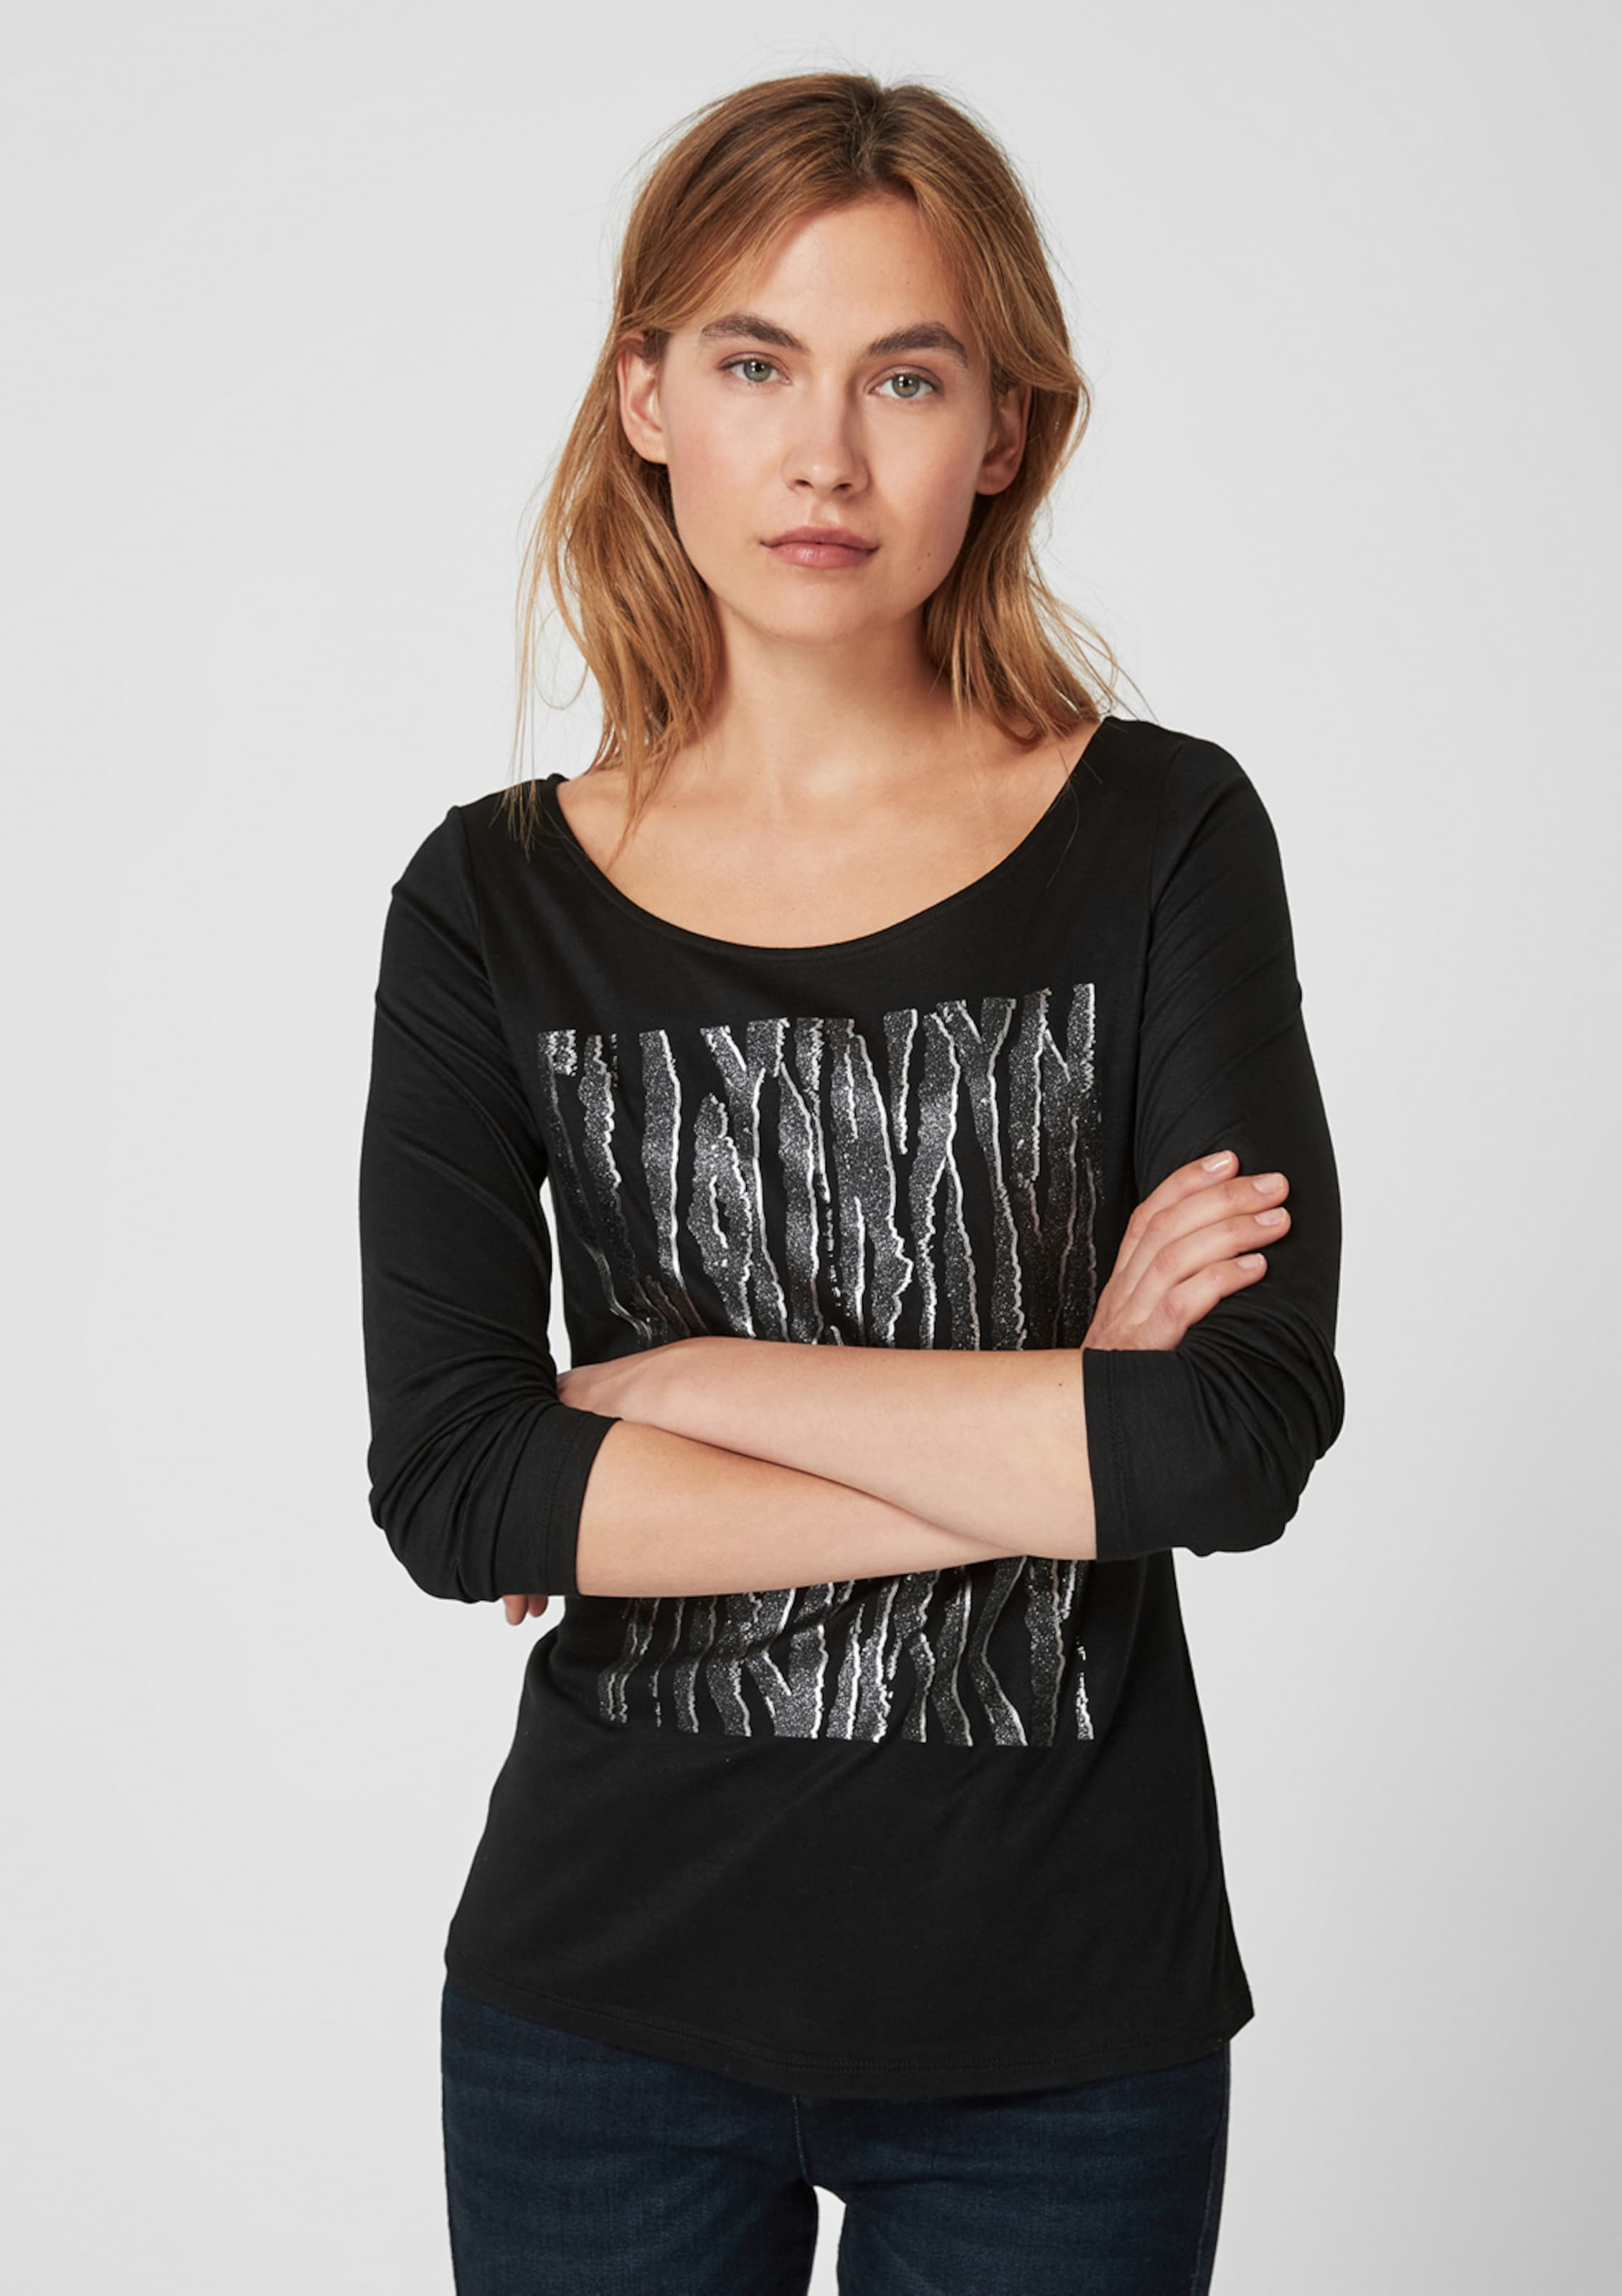 oliver S Weiß SilbergrauSchwarz Black In Label Shirt orCtxshQBd